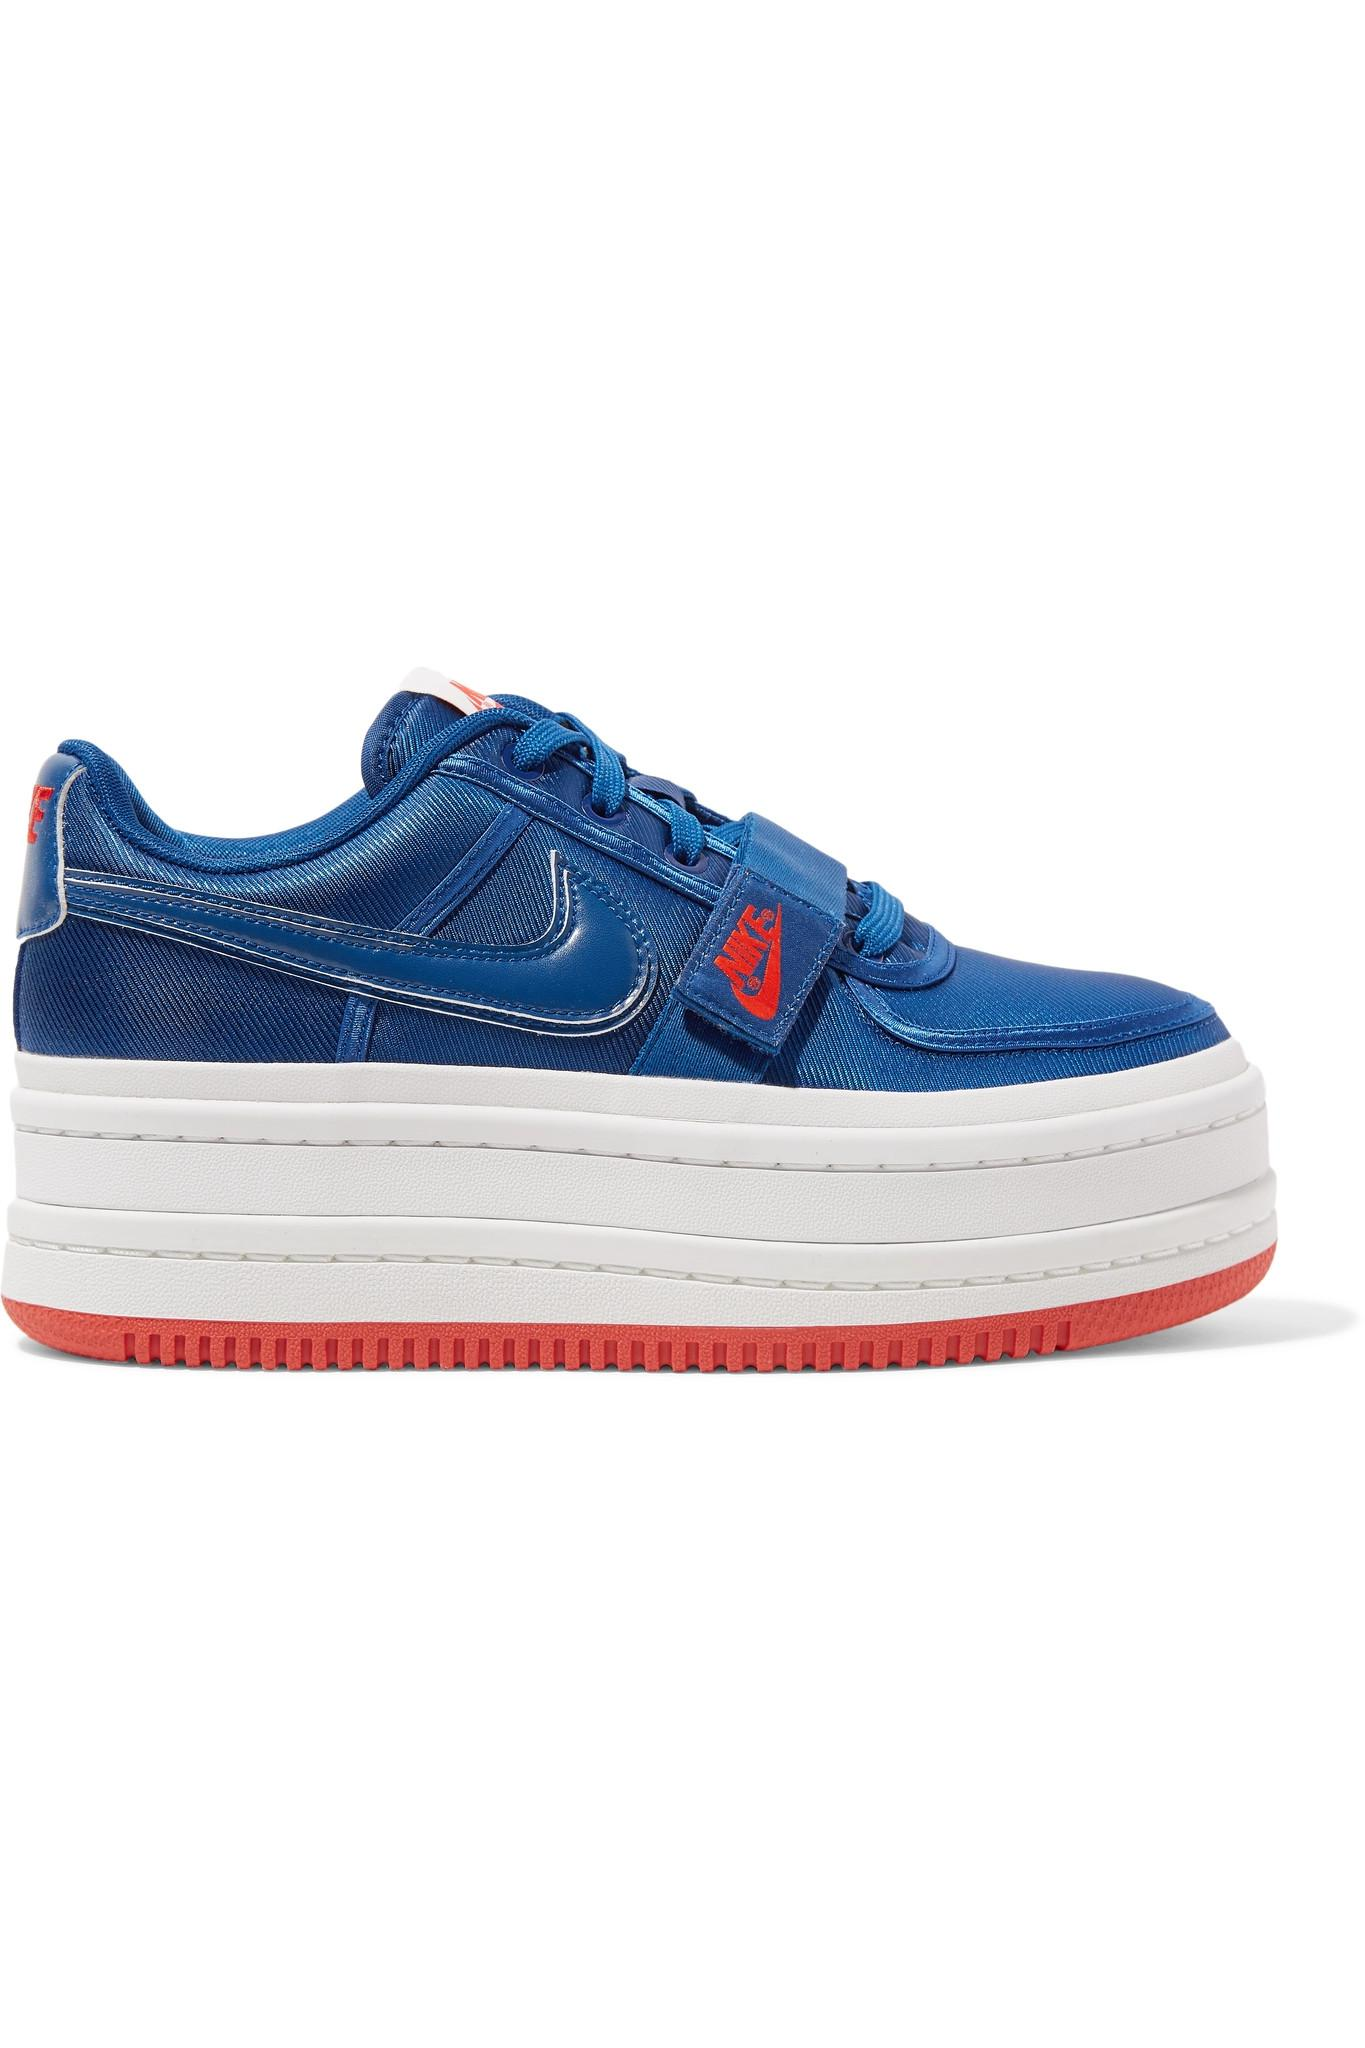 ca64da78d2cf Lyst nike vandal faux leather trimmed metallic faille platform jpg  1365x2048 Nike blue platform